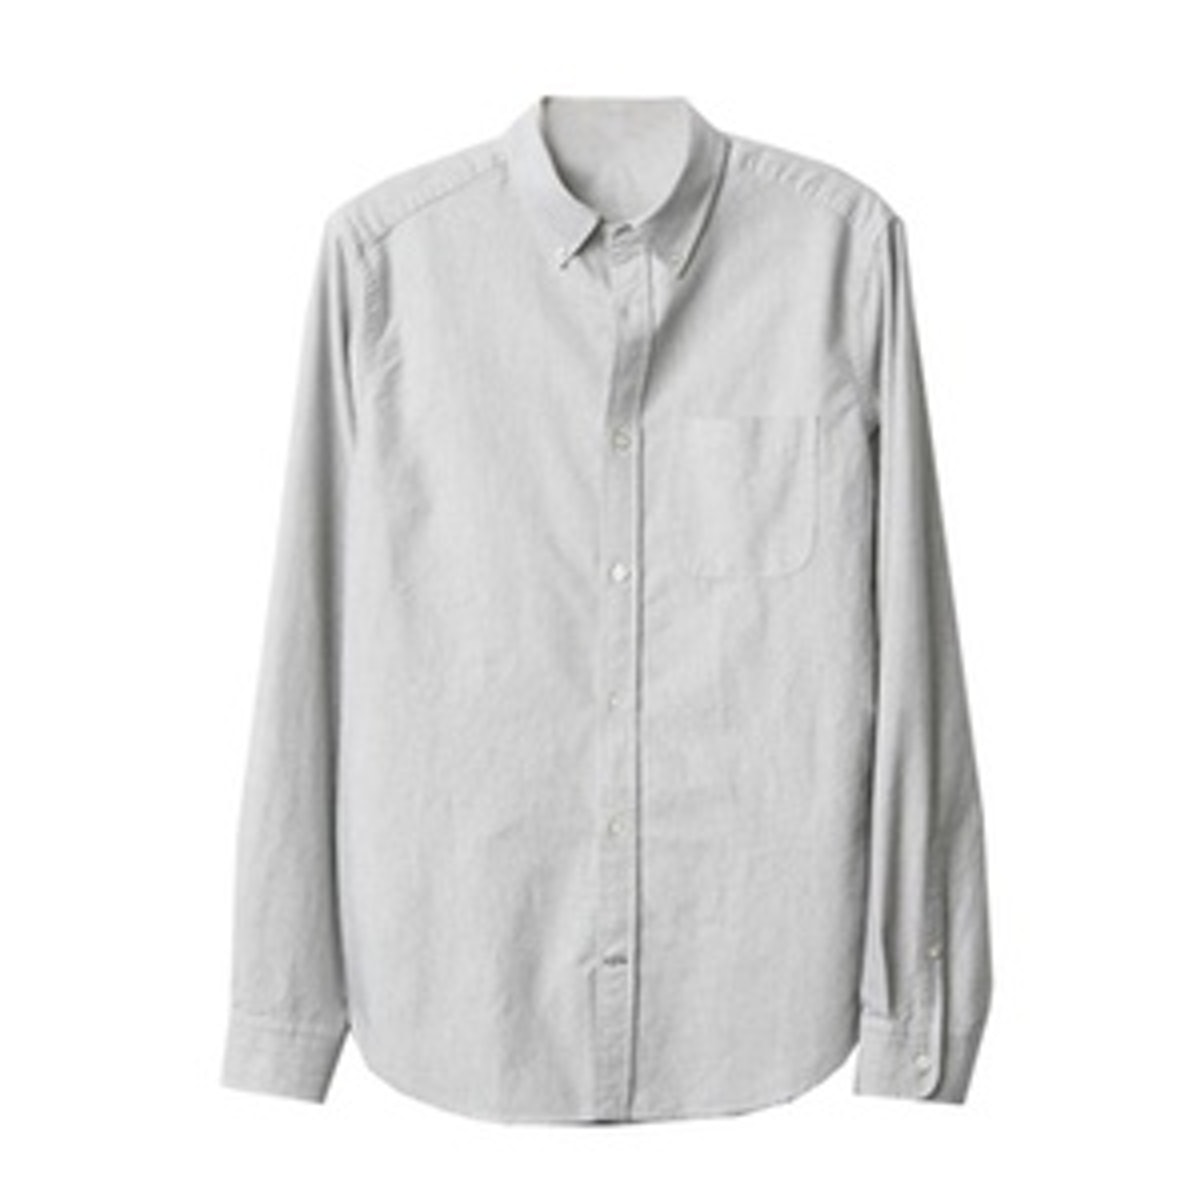 Heathered Oxford Shirt